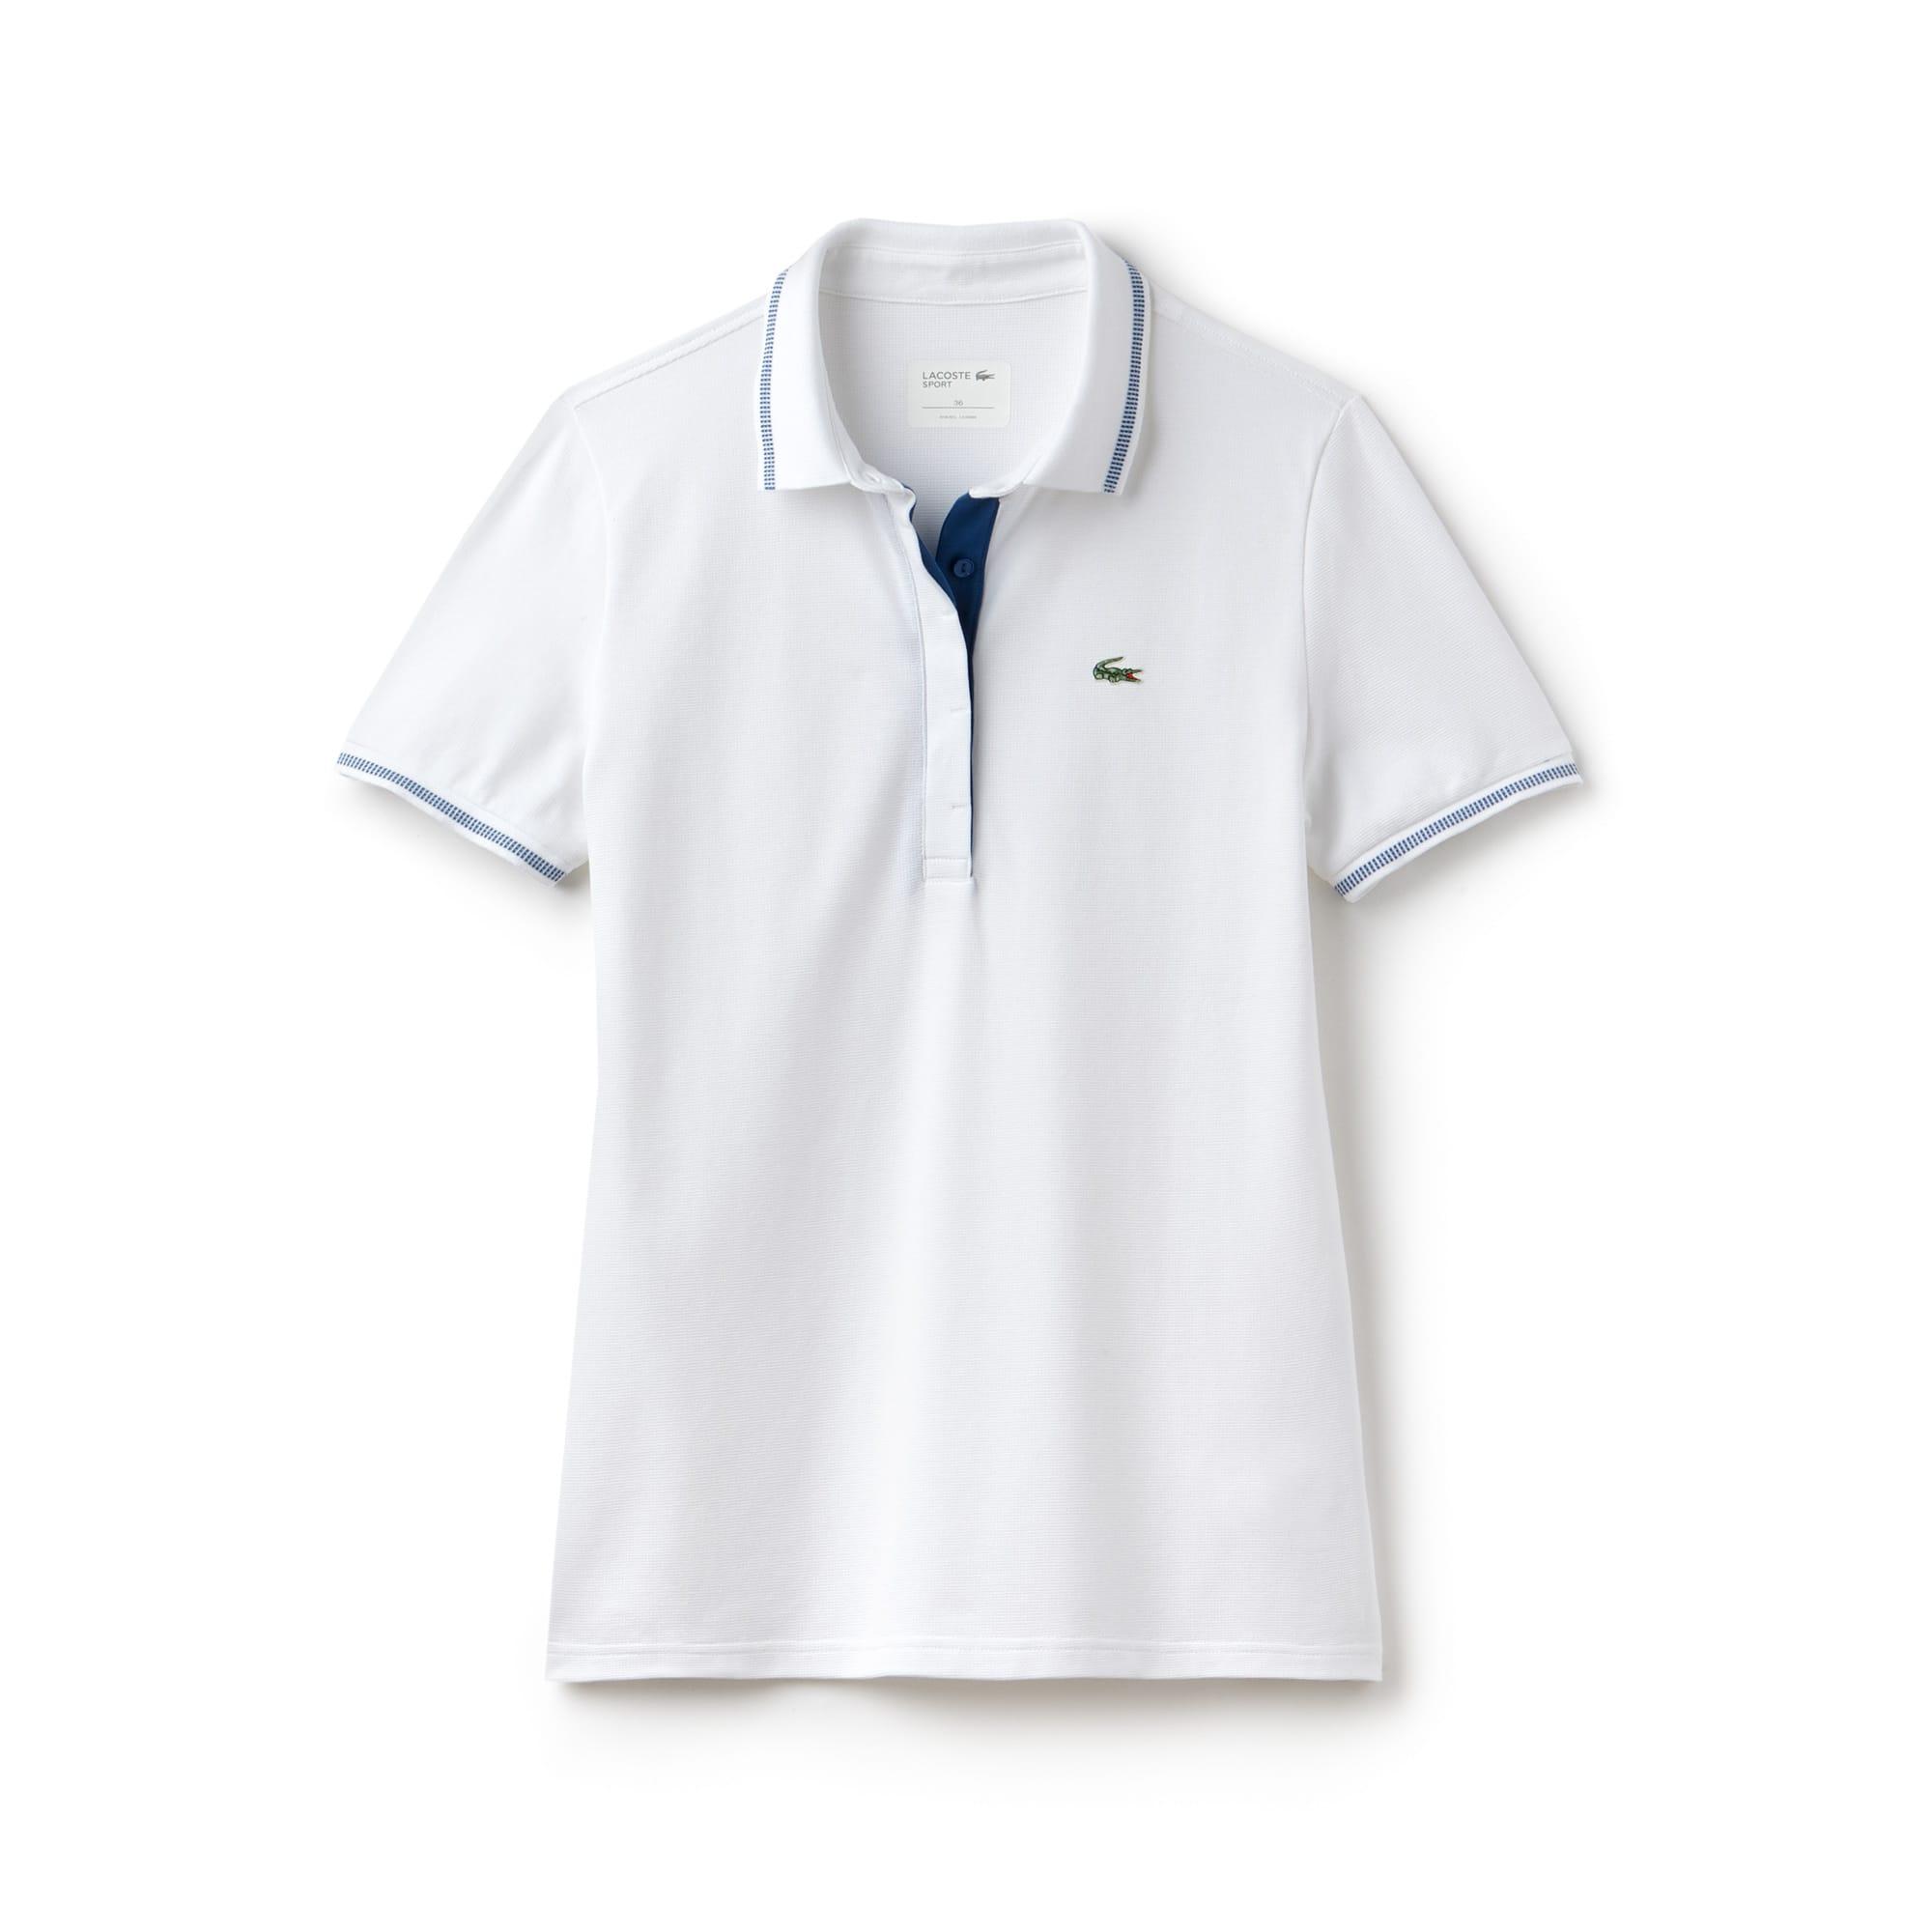 Damen LACOSTE SPORT leichtes Stretch-Golf-Poloshirt